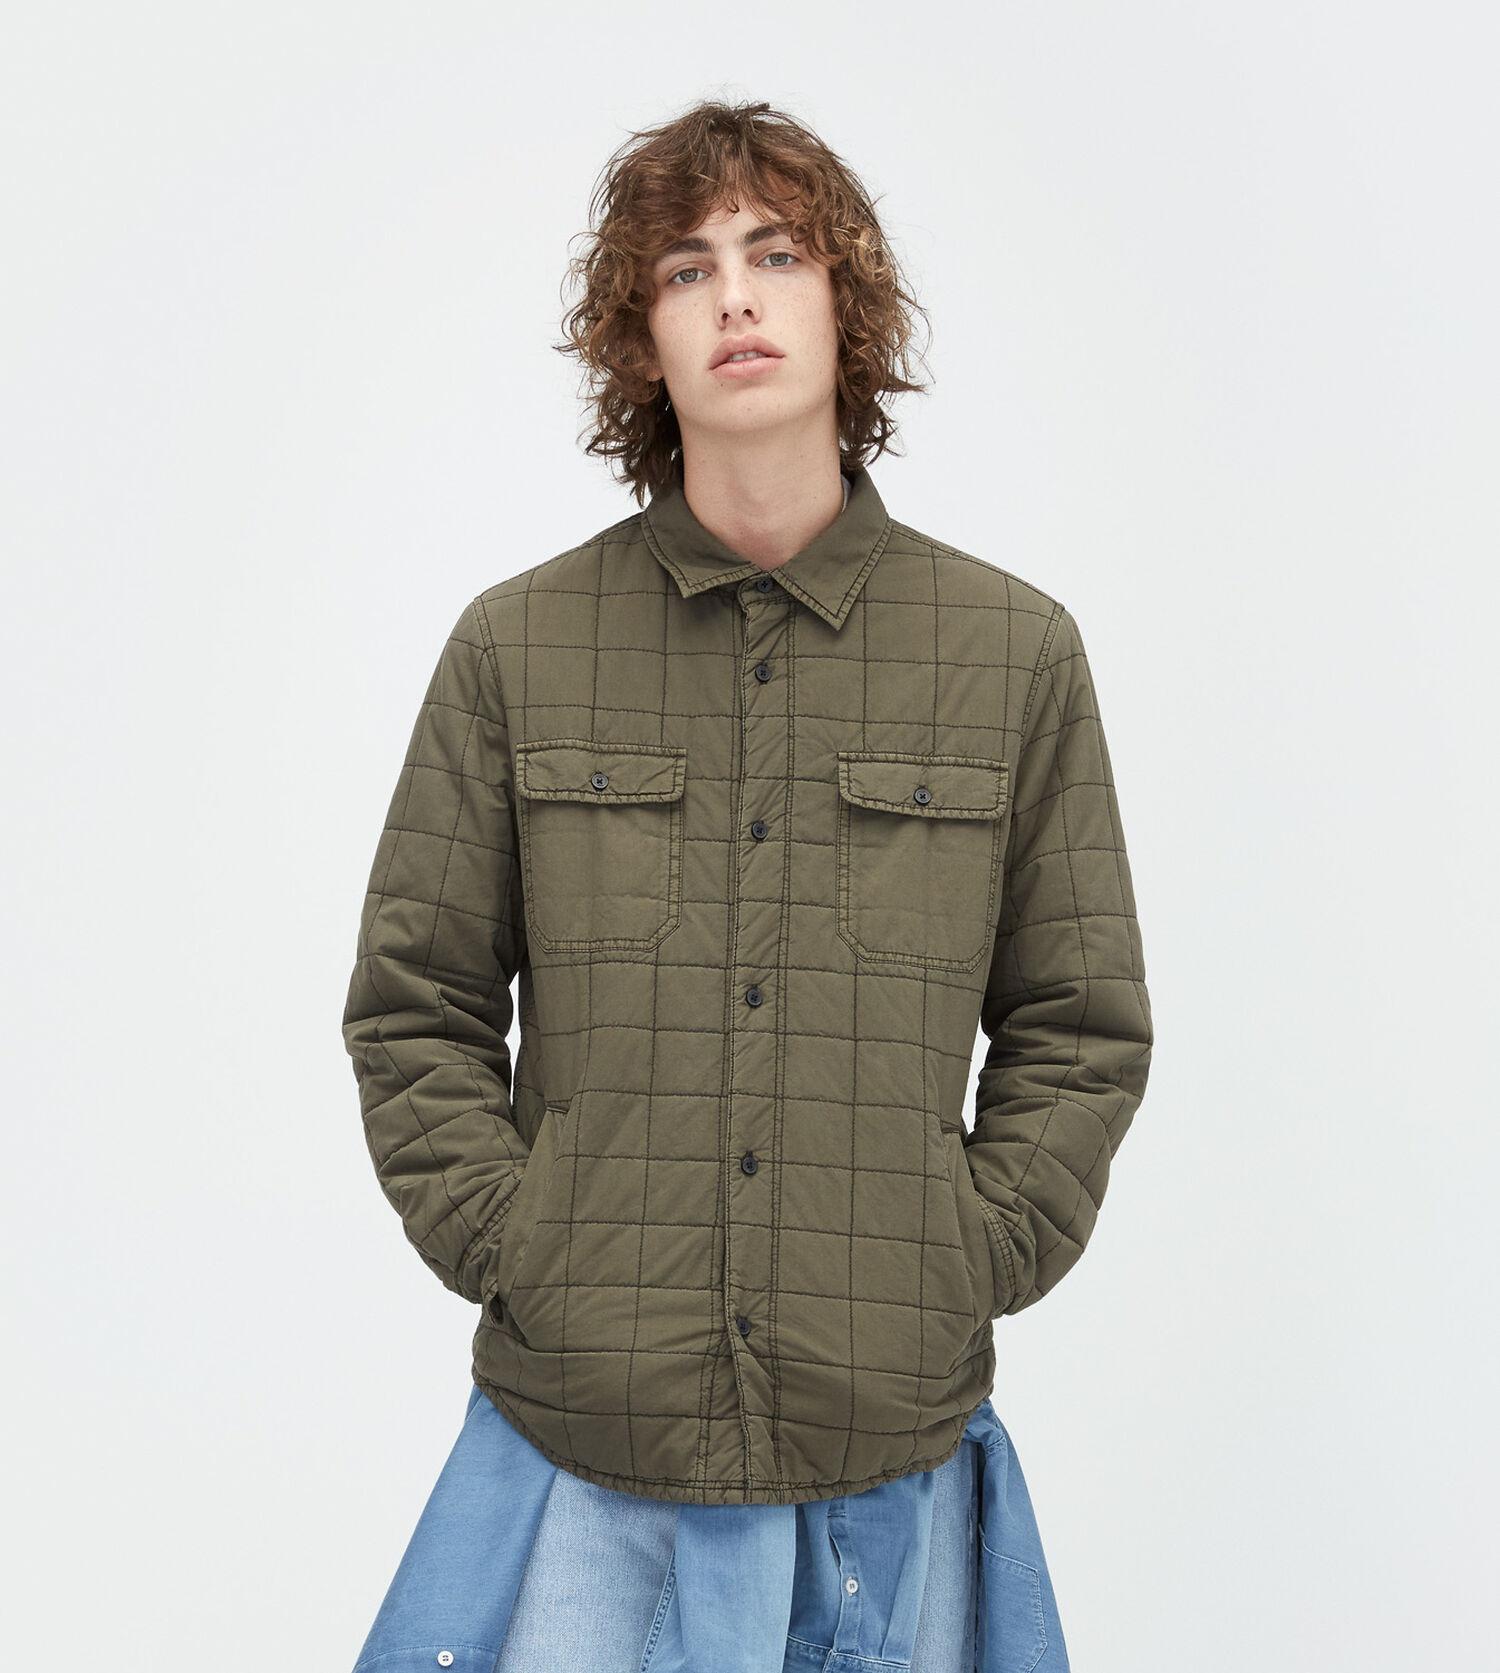 Men's Quilted Shirt Jacket | UGG® Official | UGG.com : mens quilted shirt - Adamdwight.com